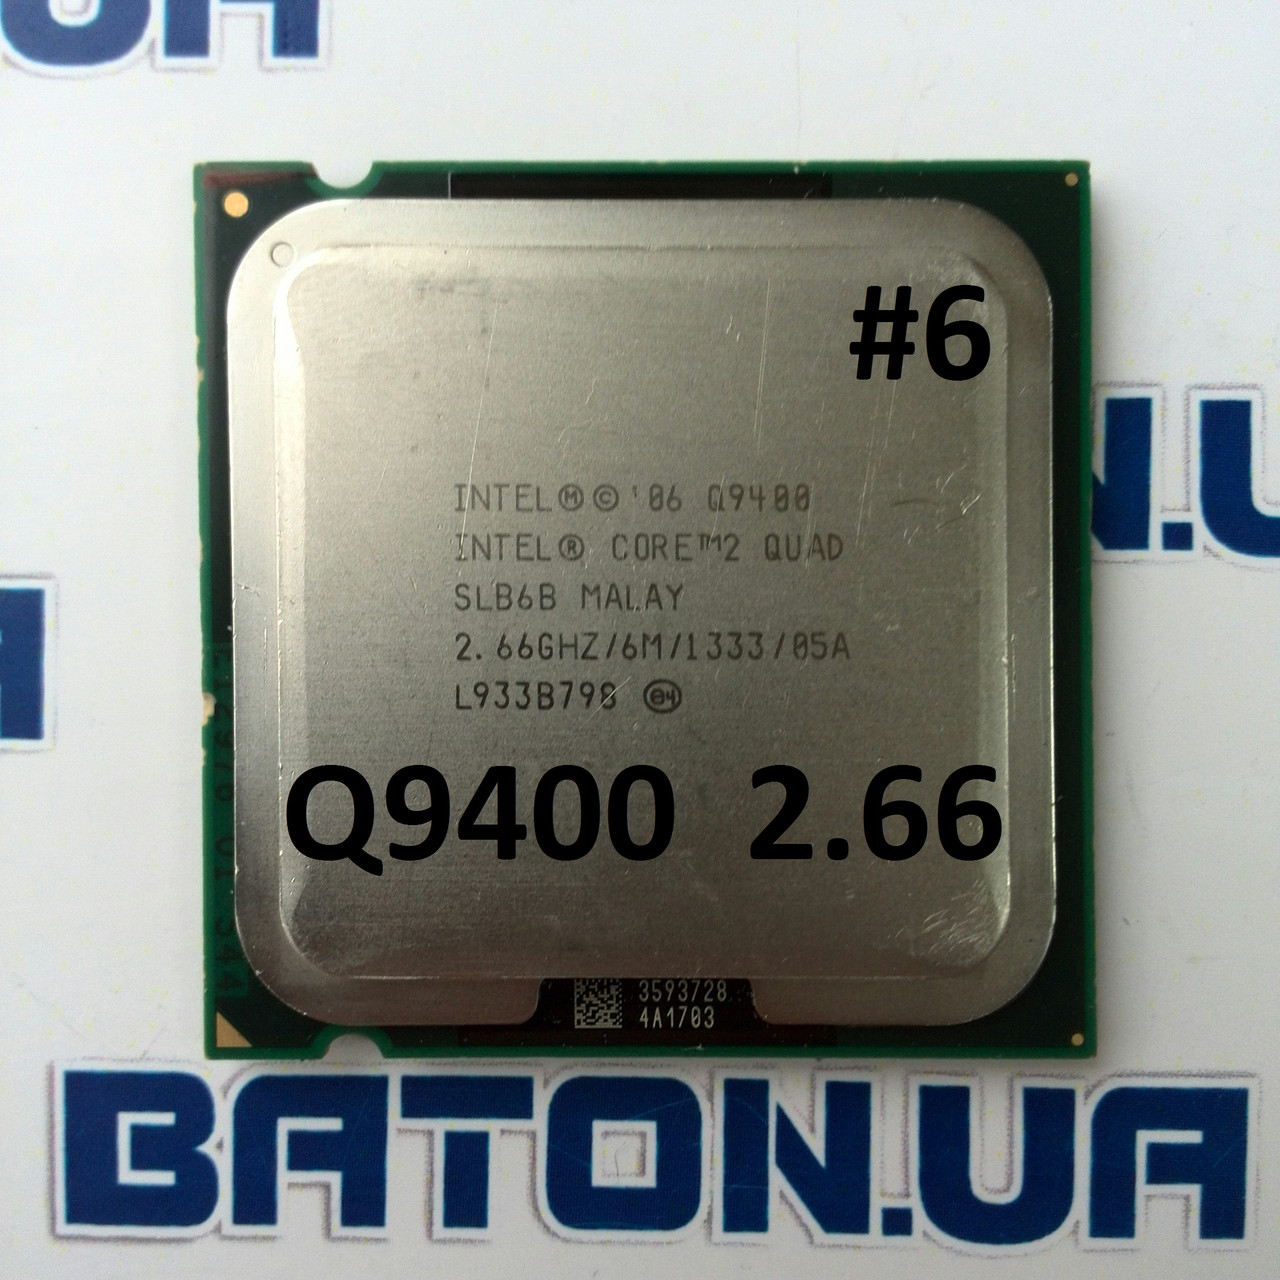 Процессор  ЛОТ #6 Intel® Core™2 Quad Q9400 2.66GHz 6M Cache 1333 MHz FSB Soket 775 Гарантия + Термопаста